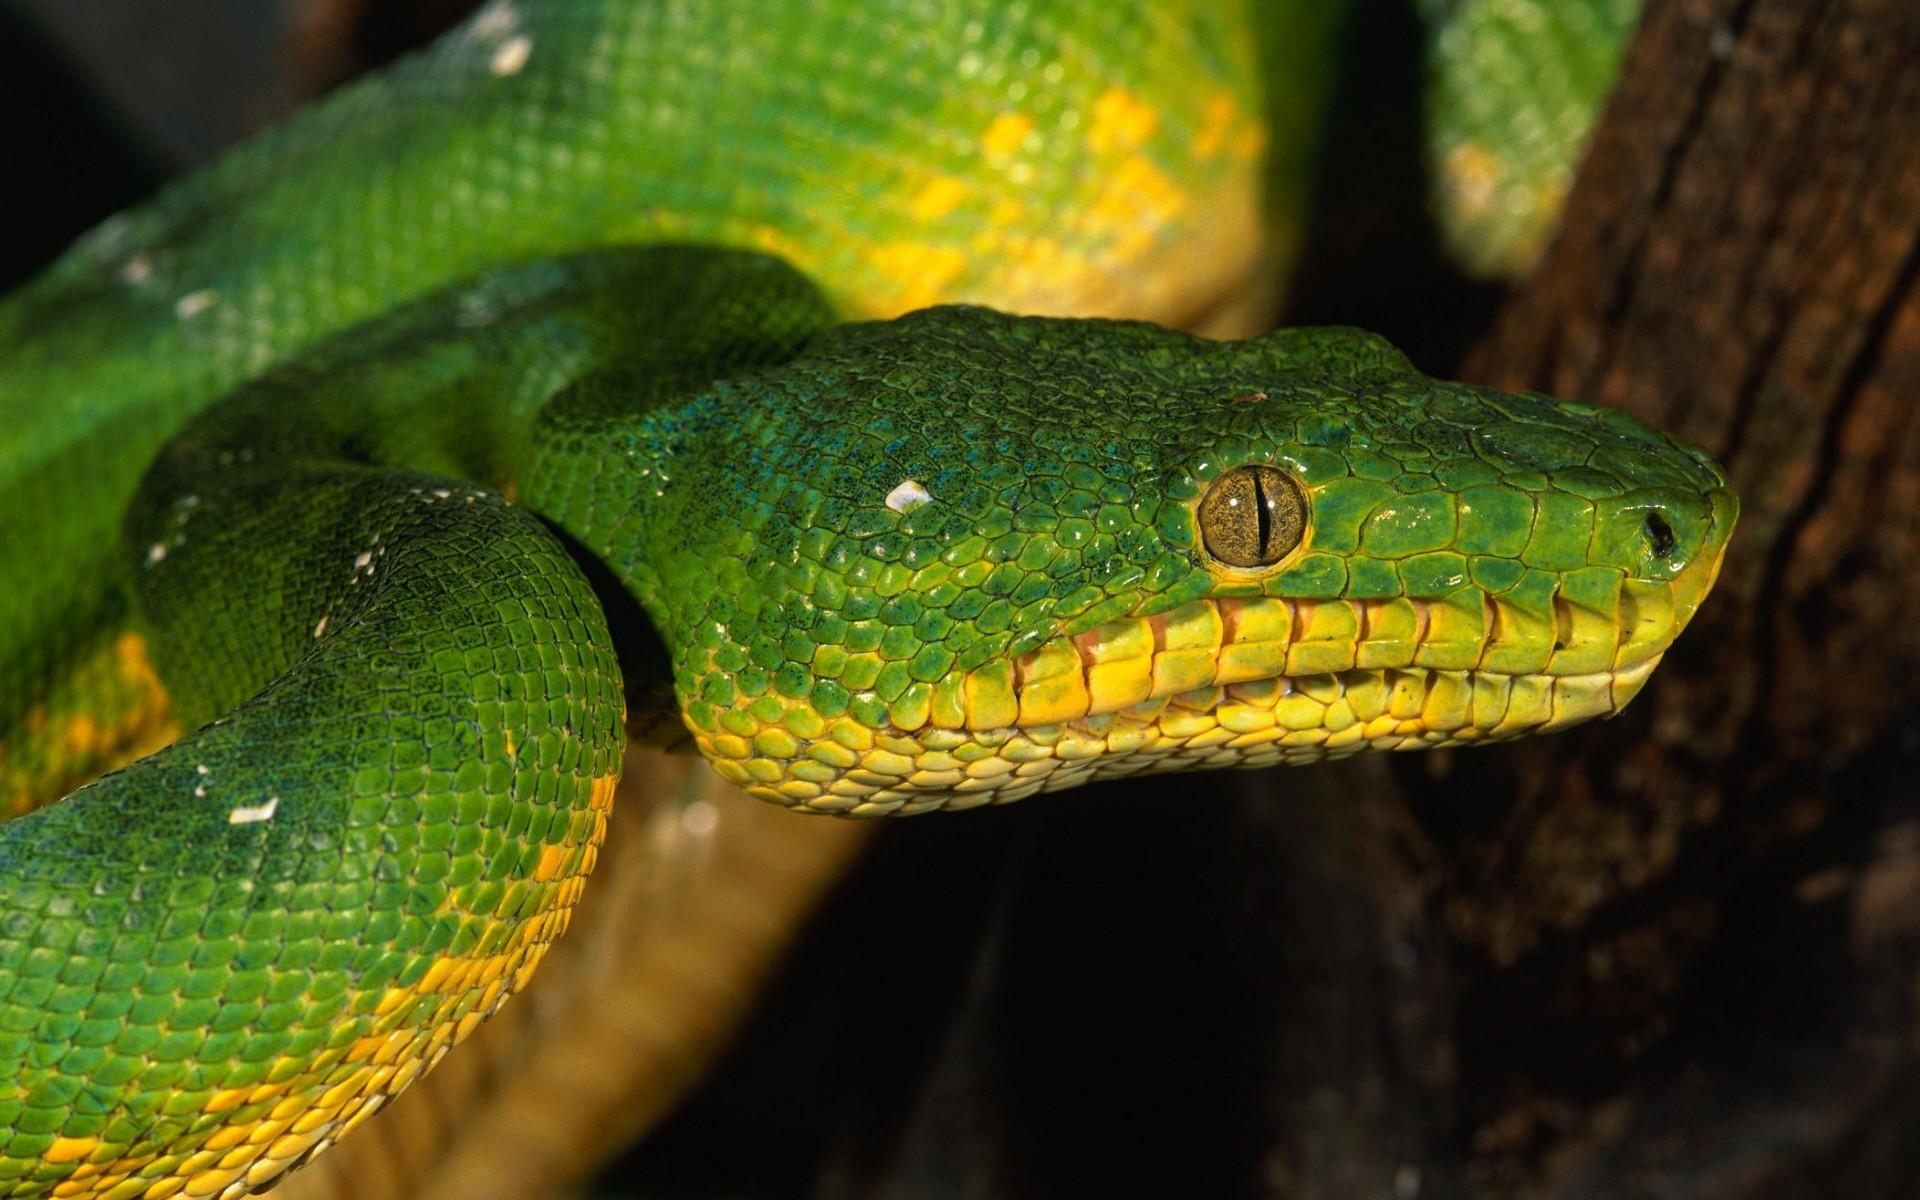 Serpiente verde - 1920x1200